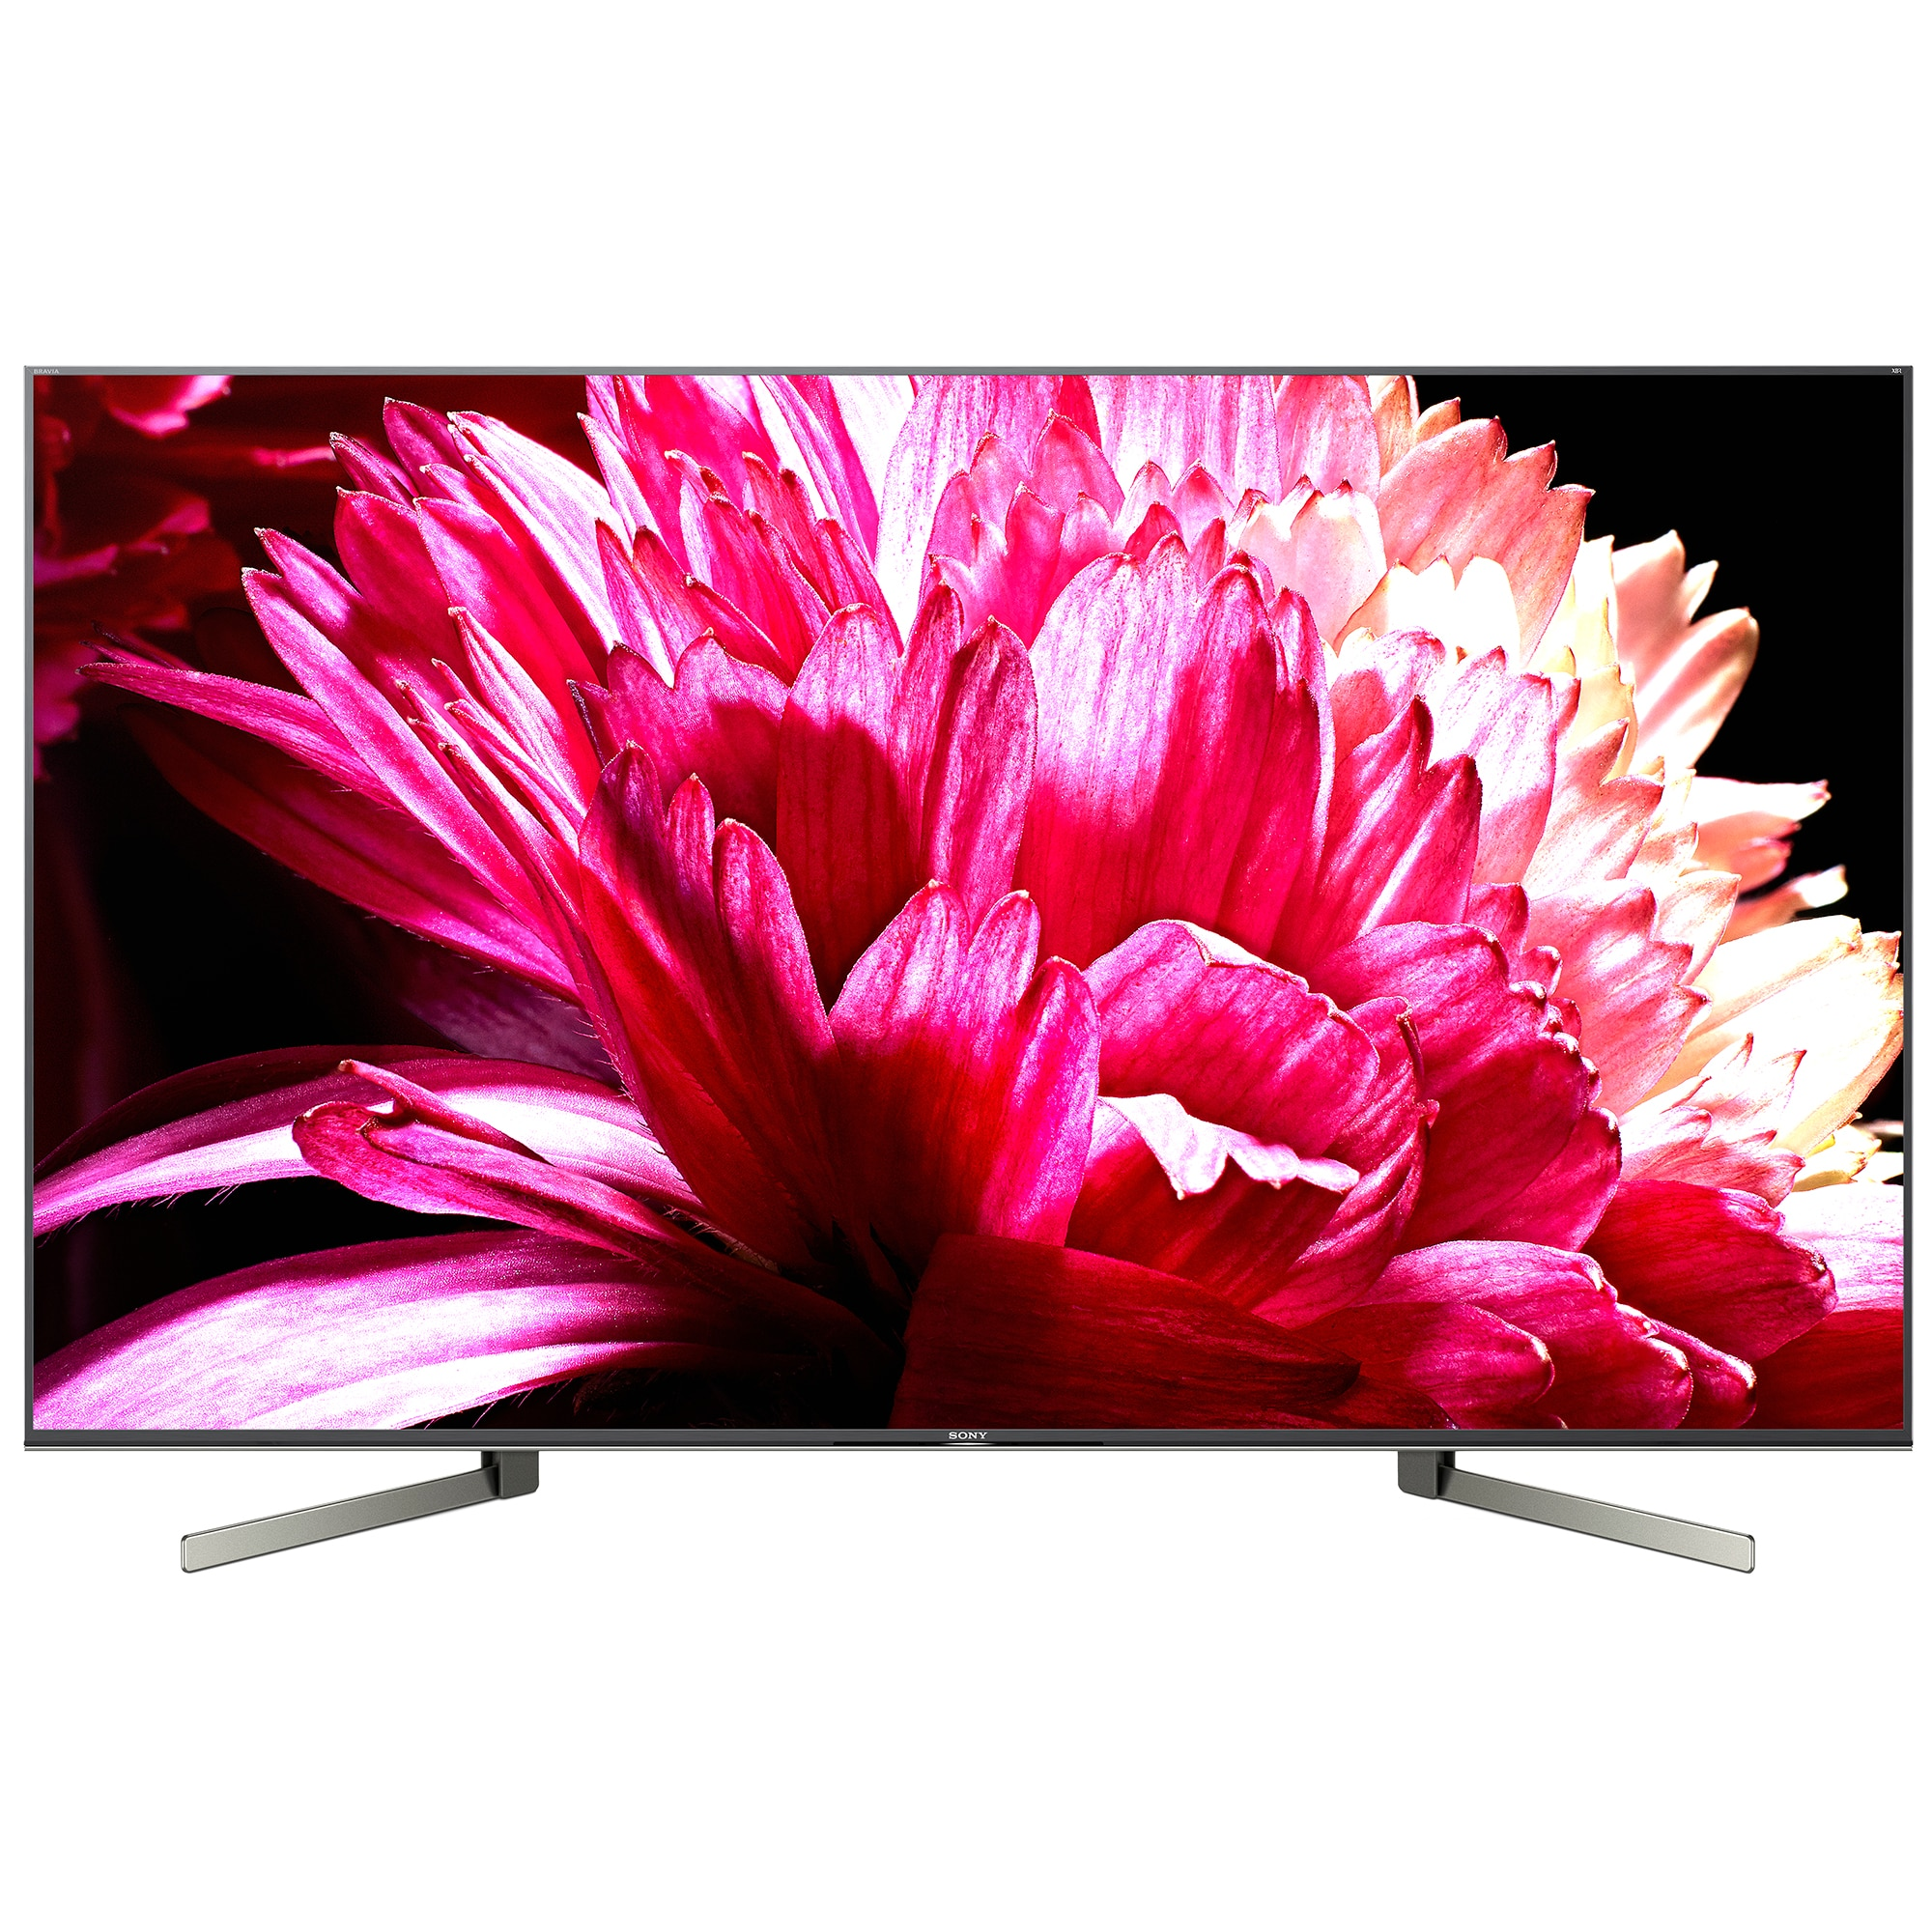 Fotografie Televizor Smart Android LED Sony BRAVIA, 138.8 cm, 55XG9505, 4K Ultra HD